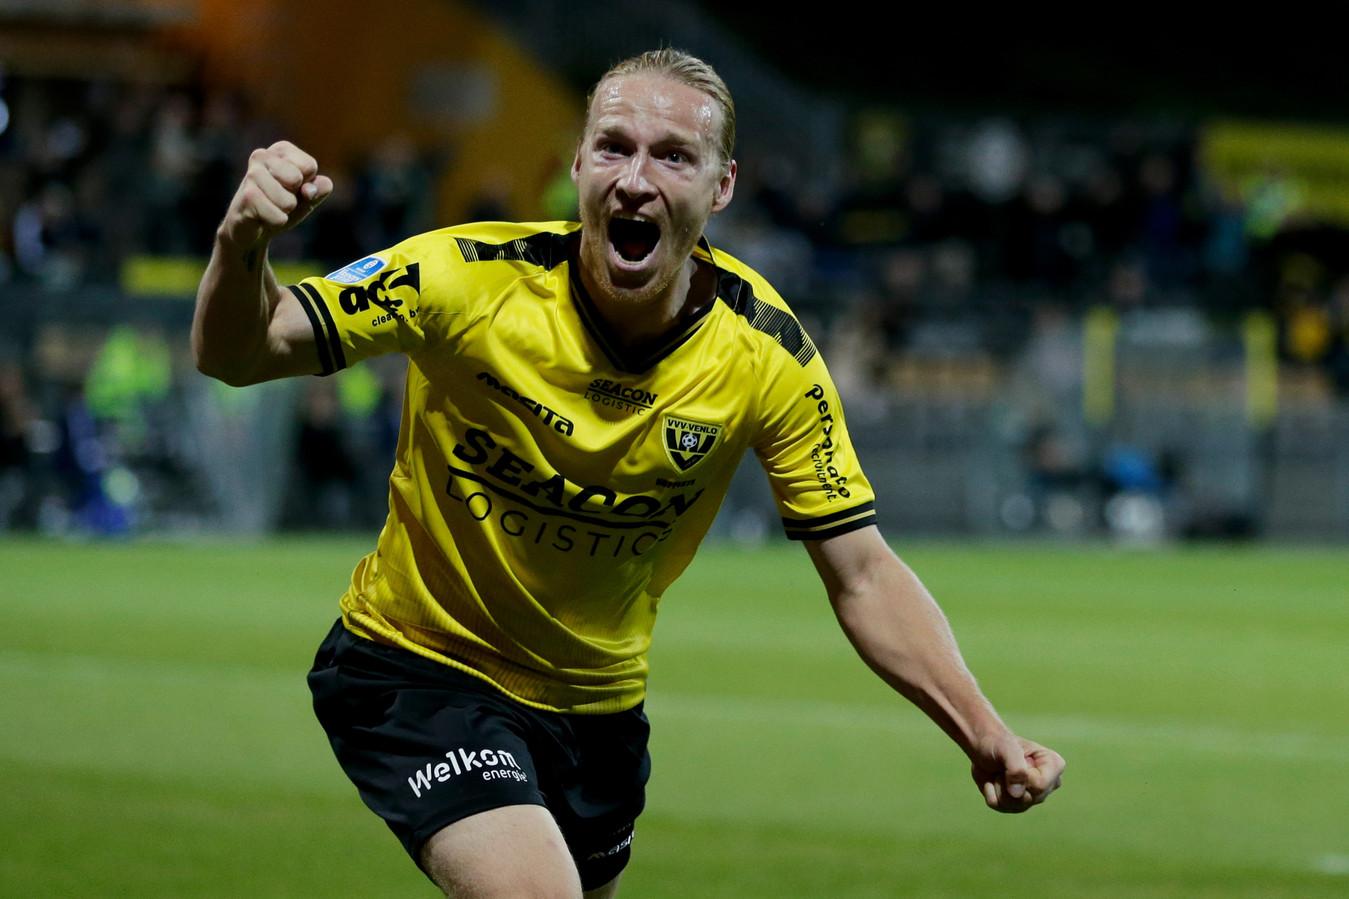 LIVE | VVV via Hupperts al na acht minuten op voorsprong tegen FC Utrecht |  Foto | AD.nl